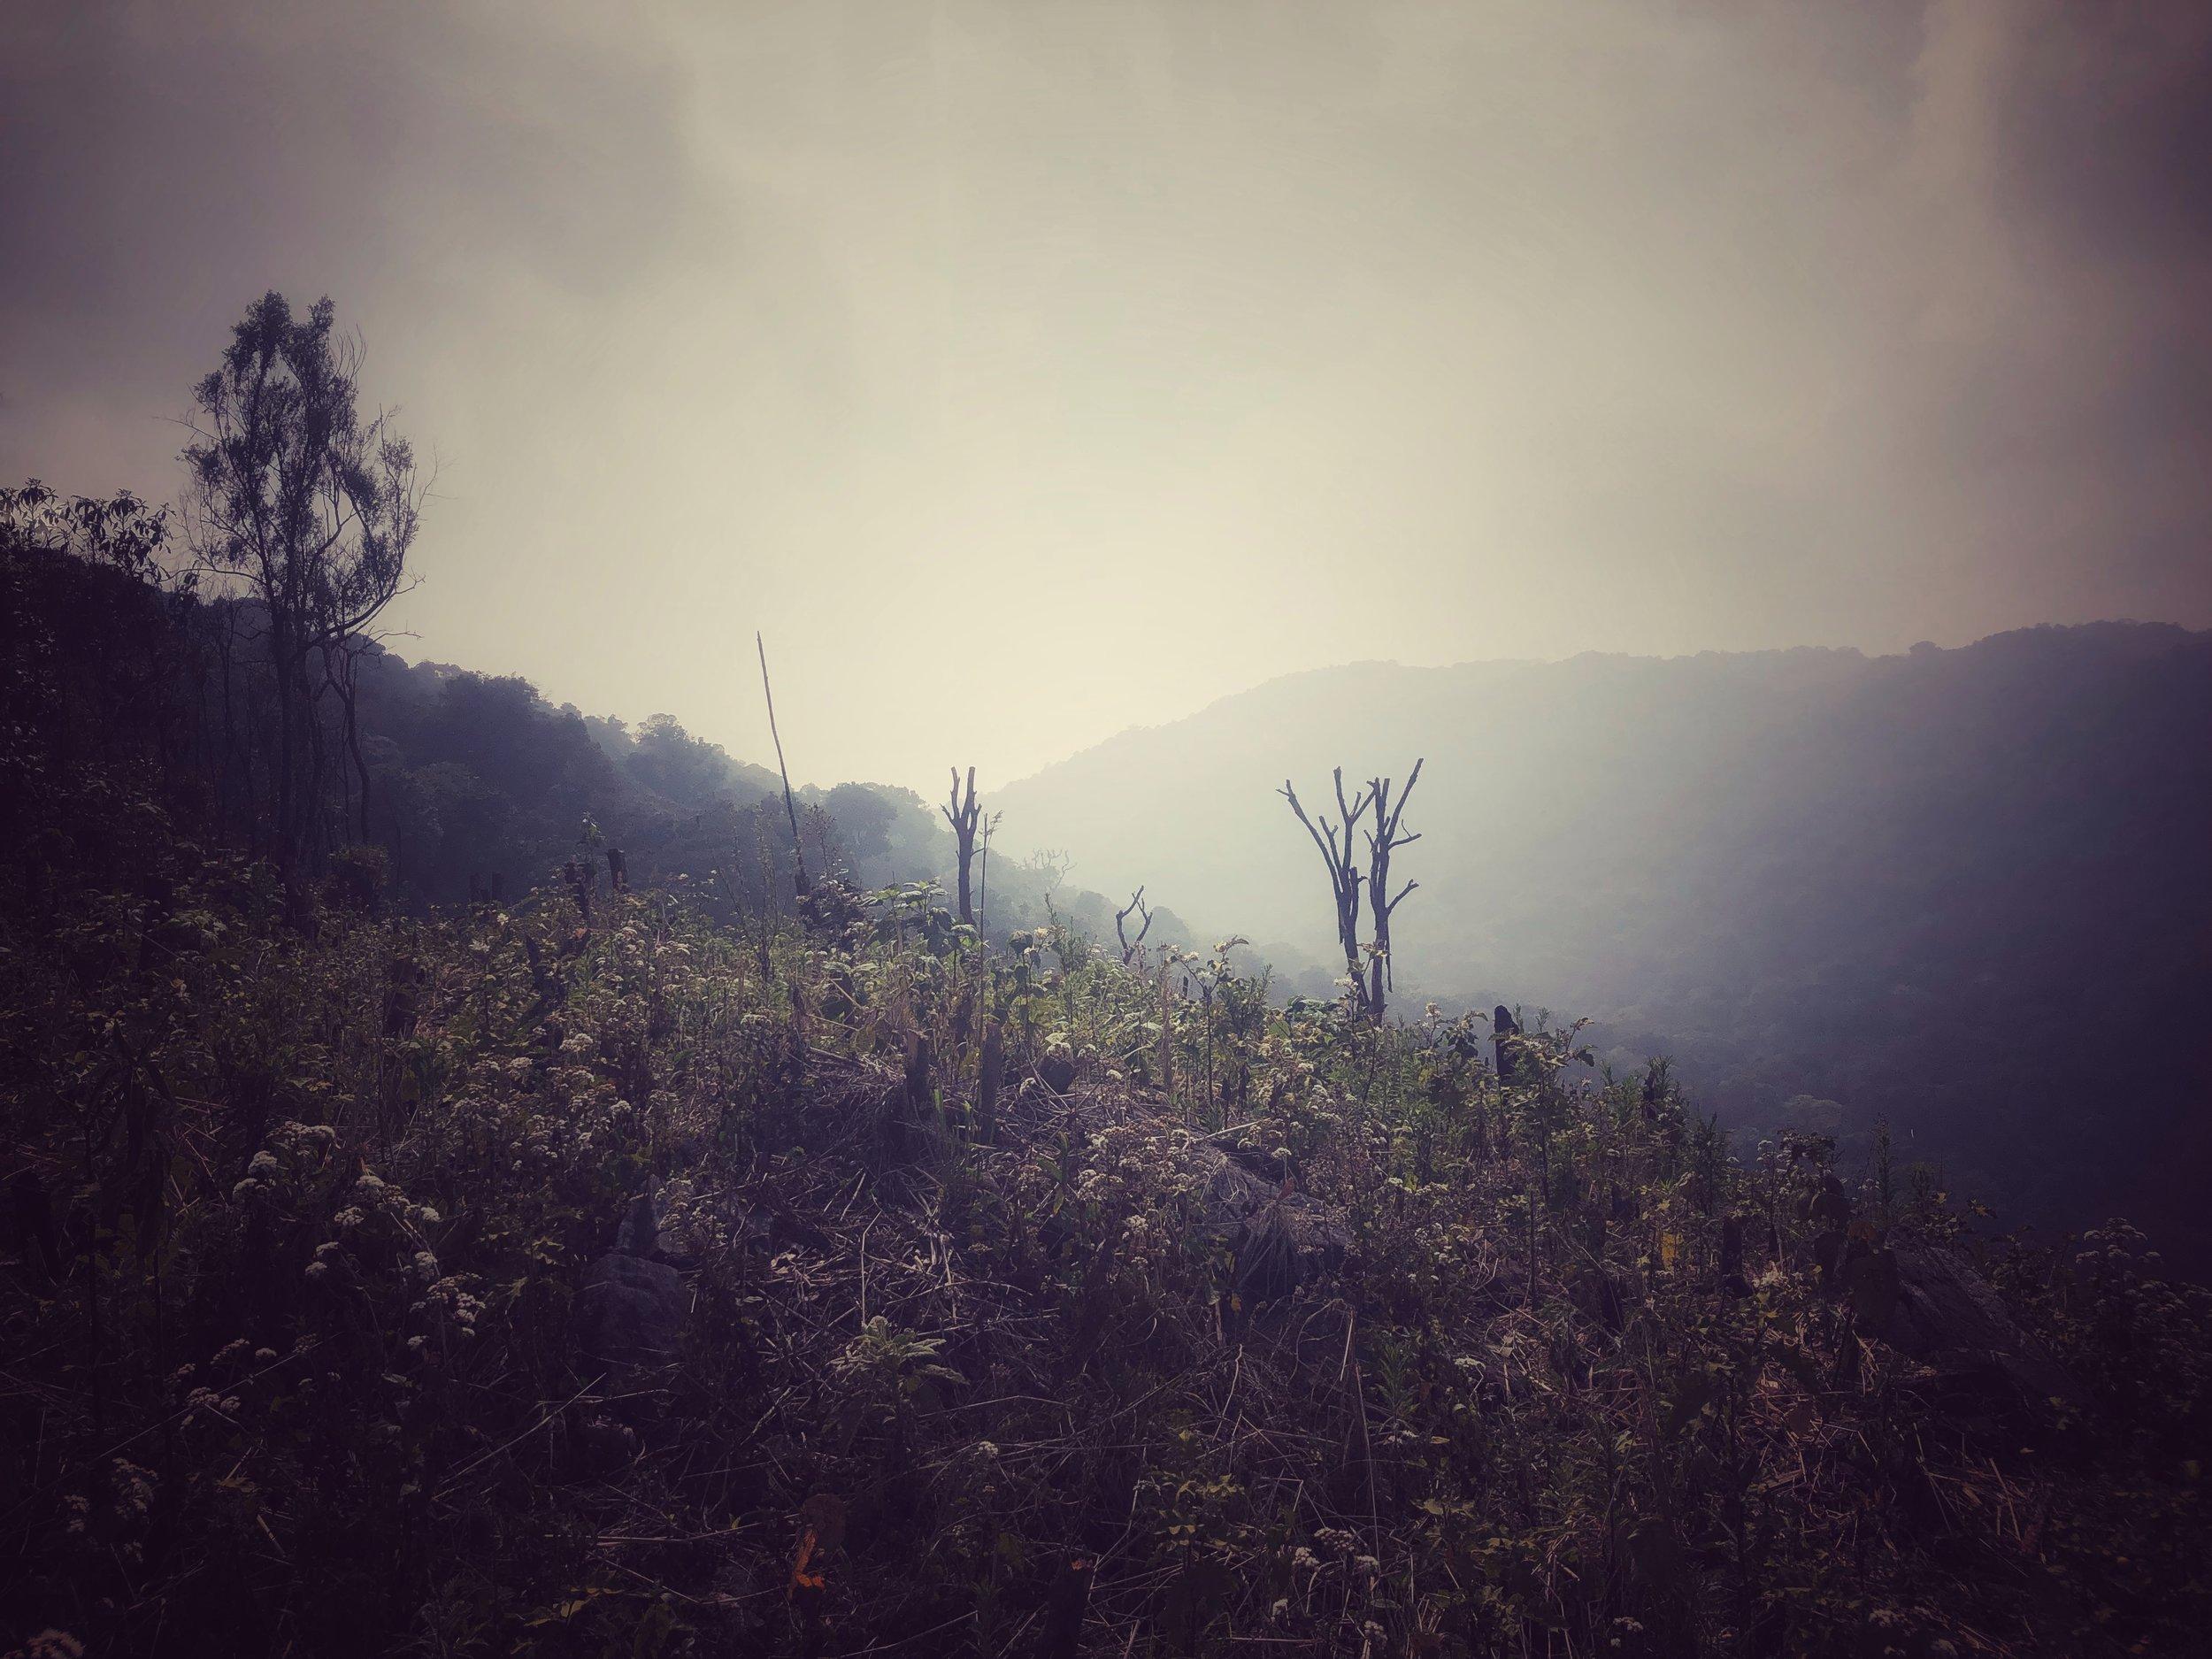 Local reserves jhummed near the park's border